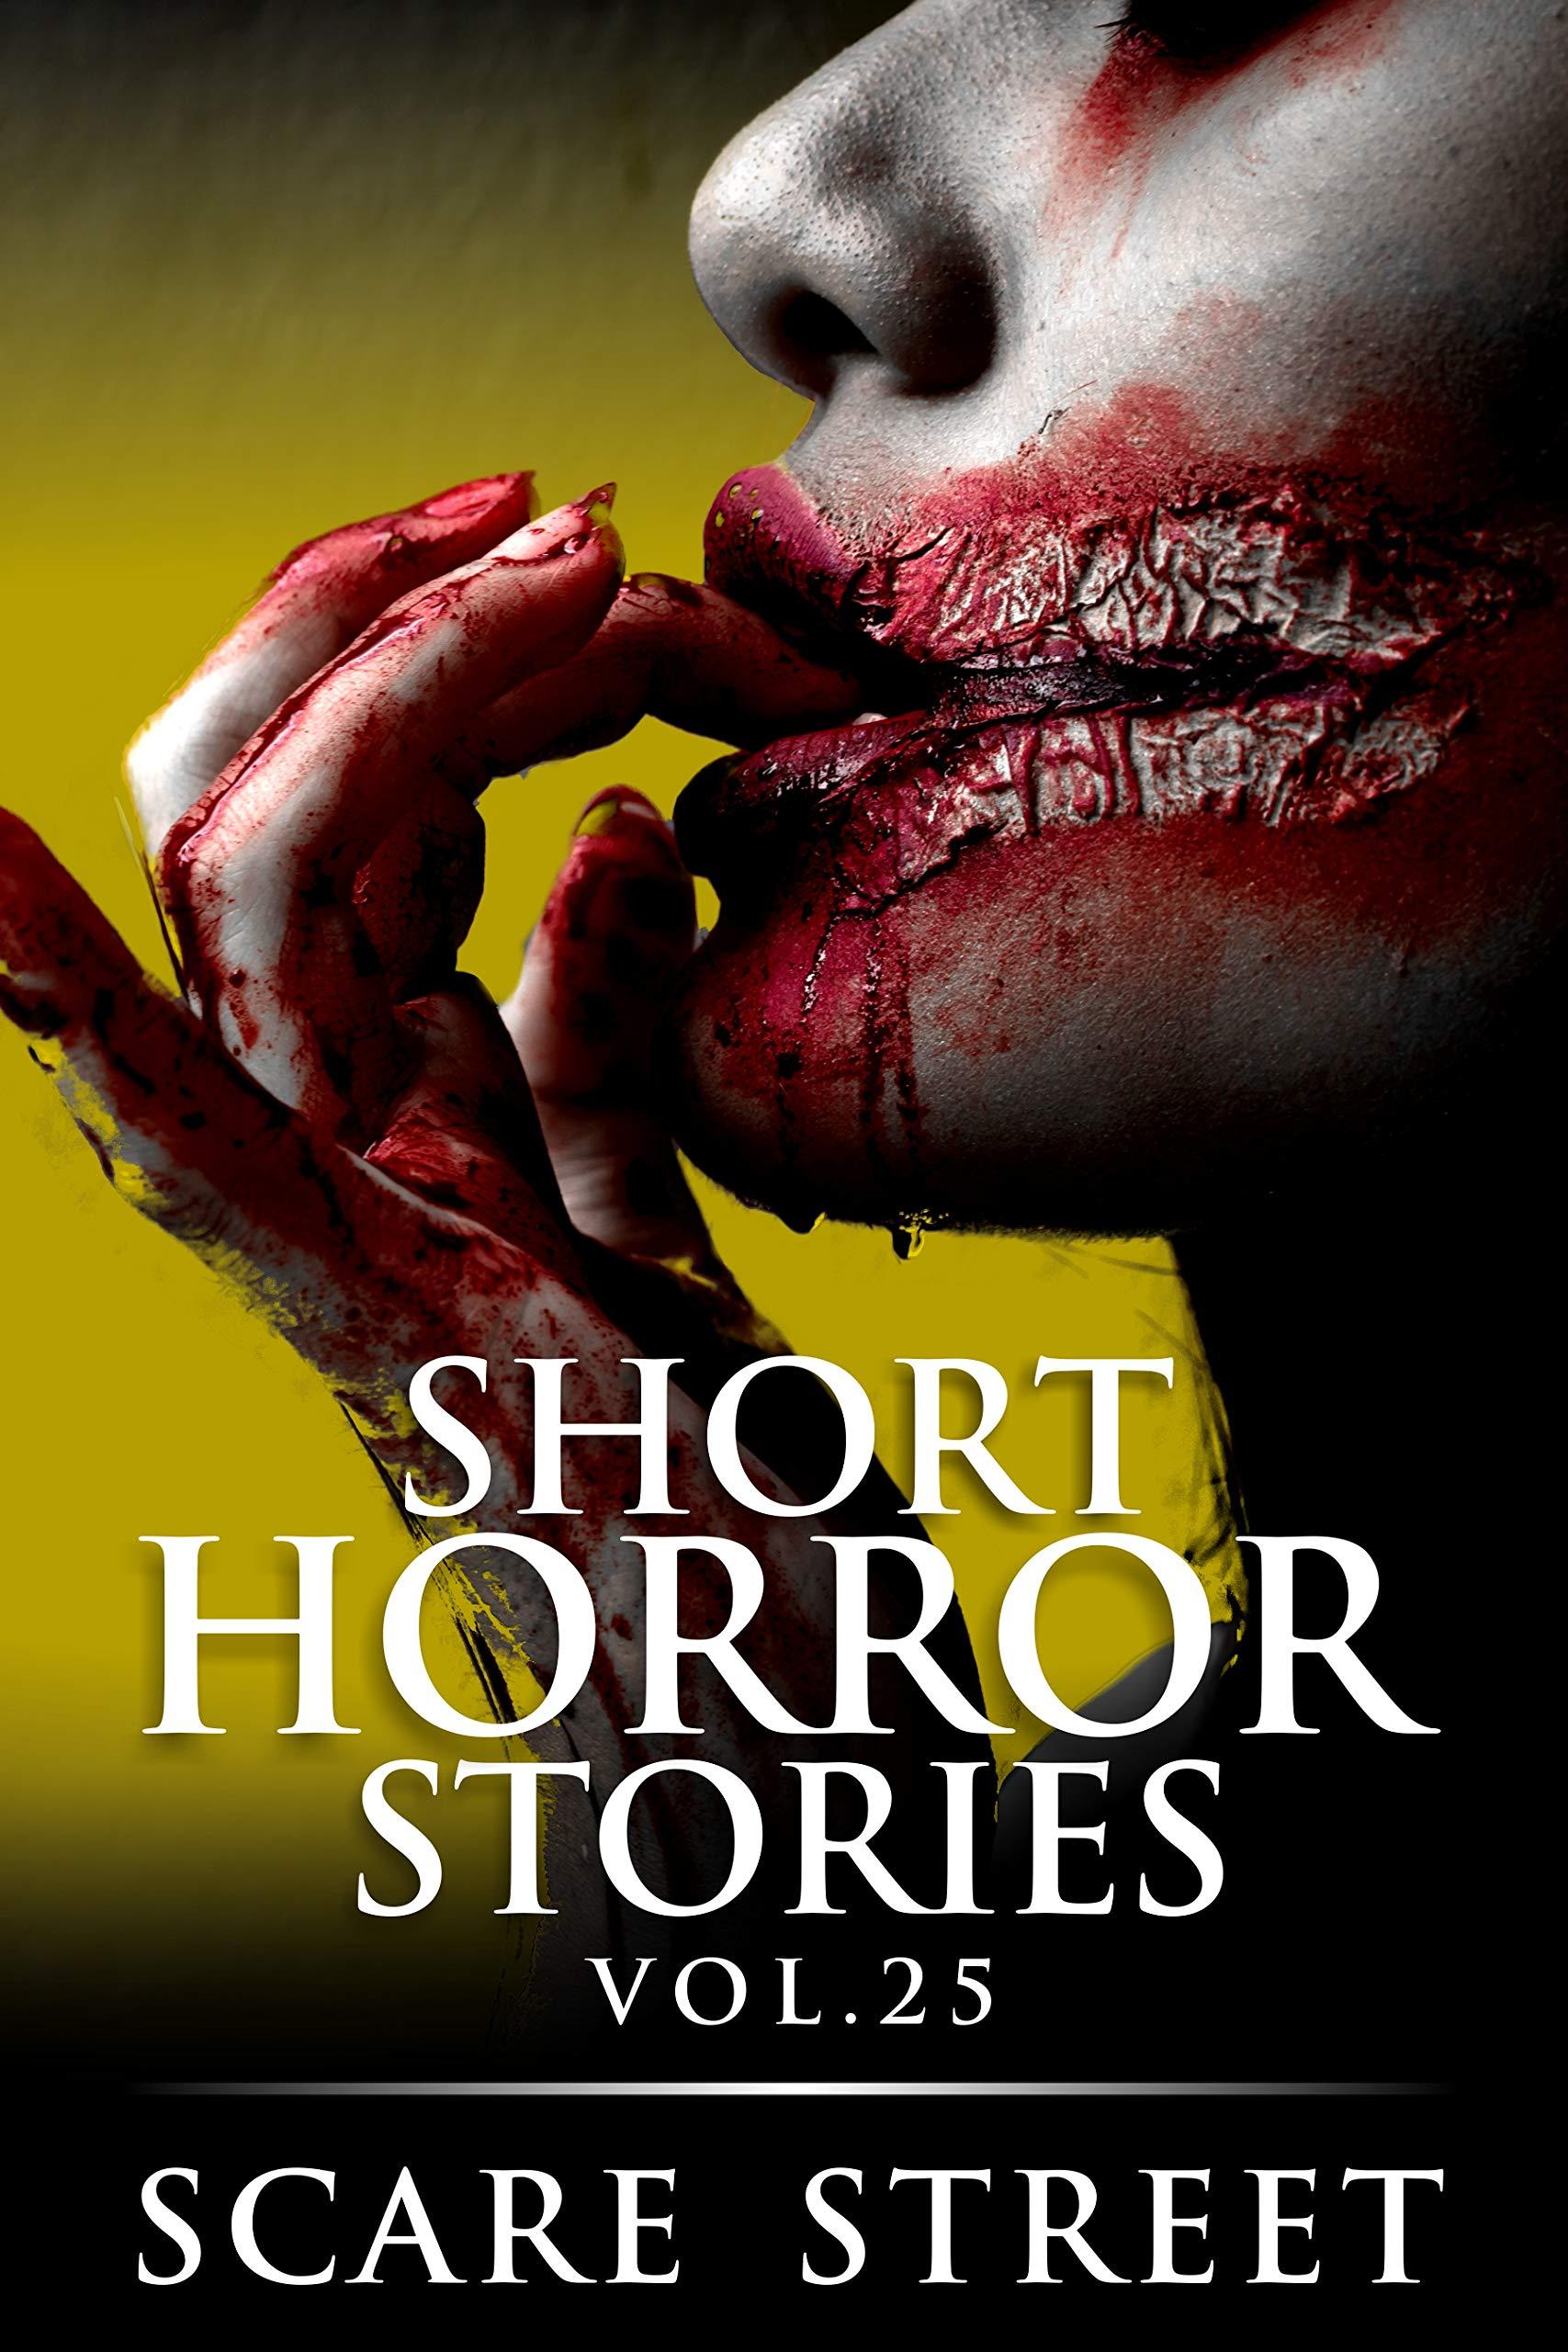 Short Horror Stories Vol. 25